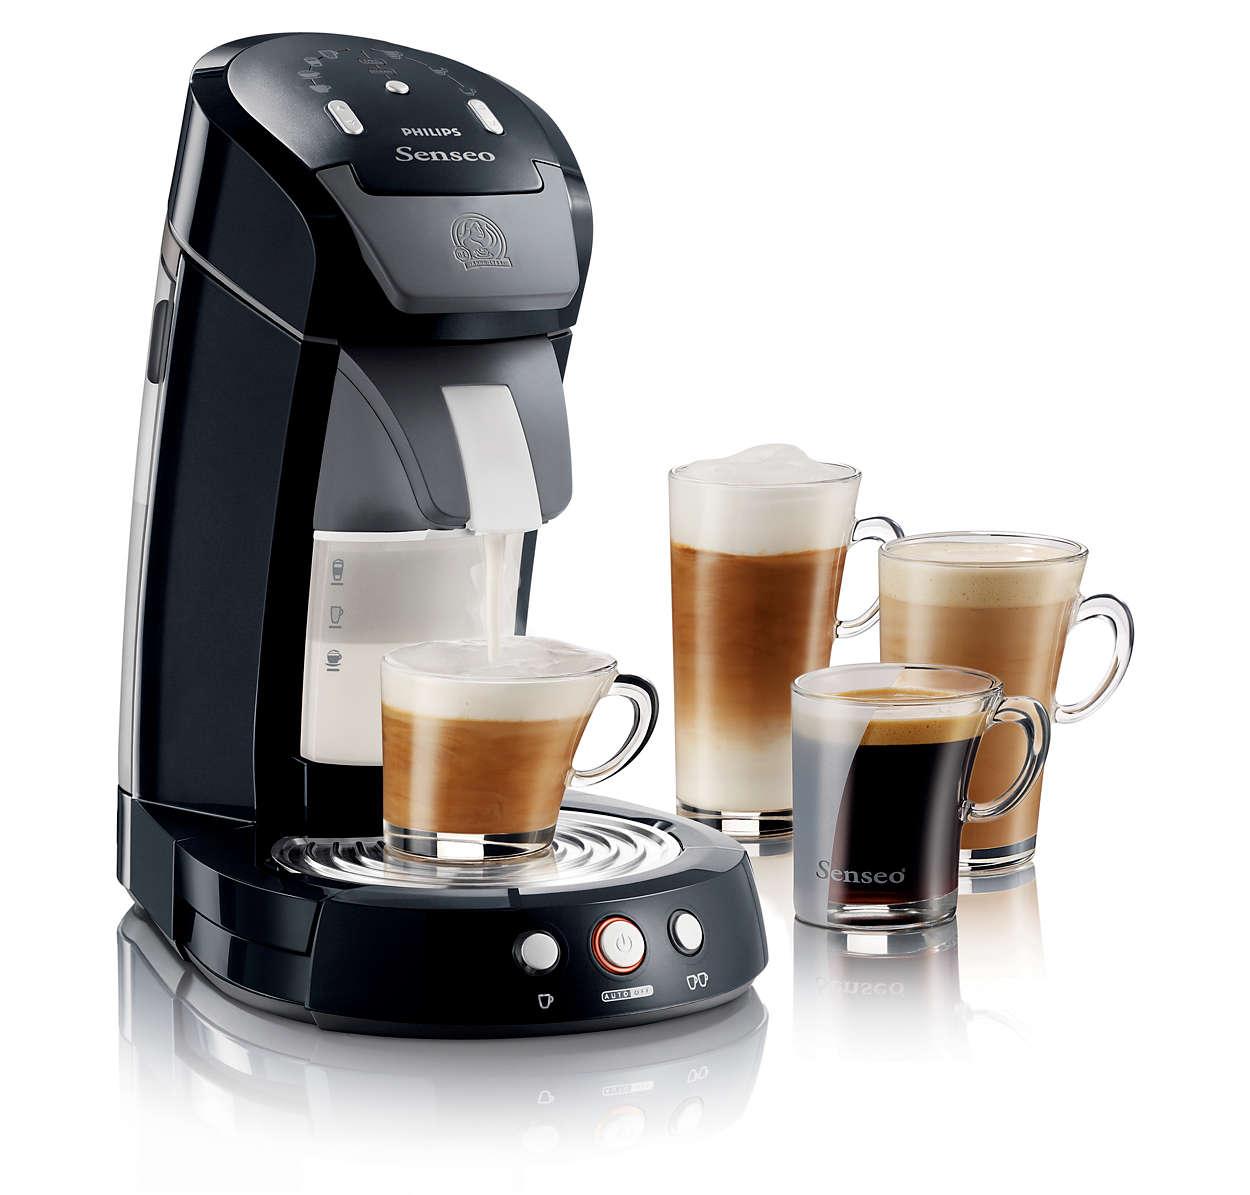 latte select machine caf dosettes hd7850 60 senseo. Black Bedroom Furniture Sets. Home Design Ideas